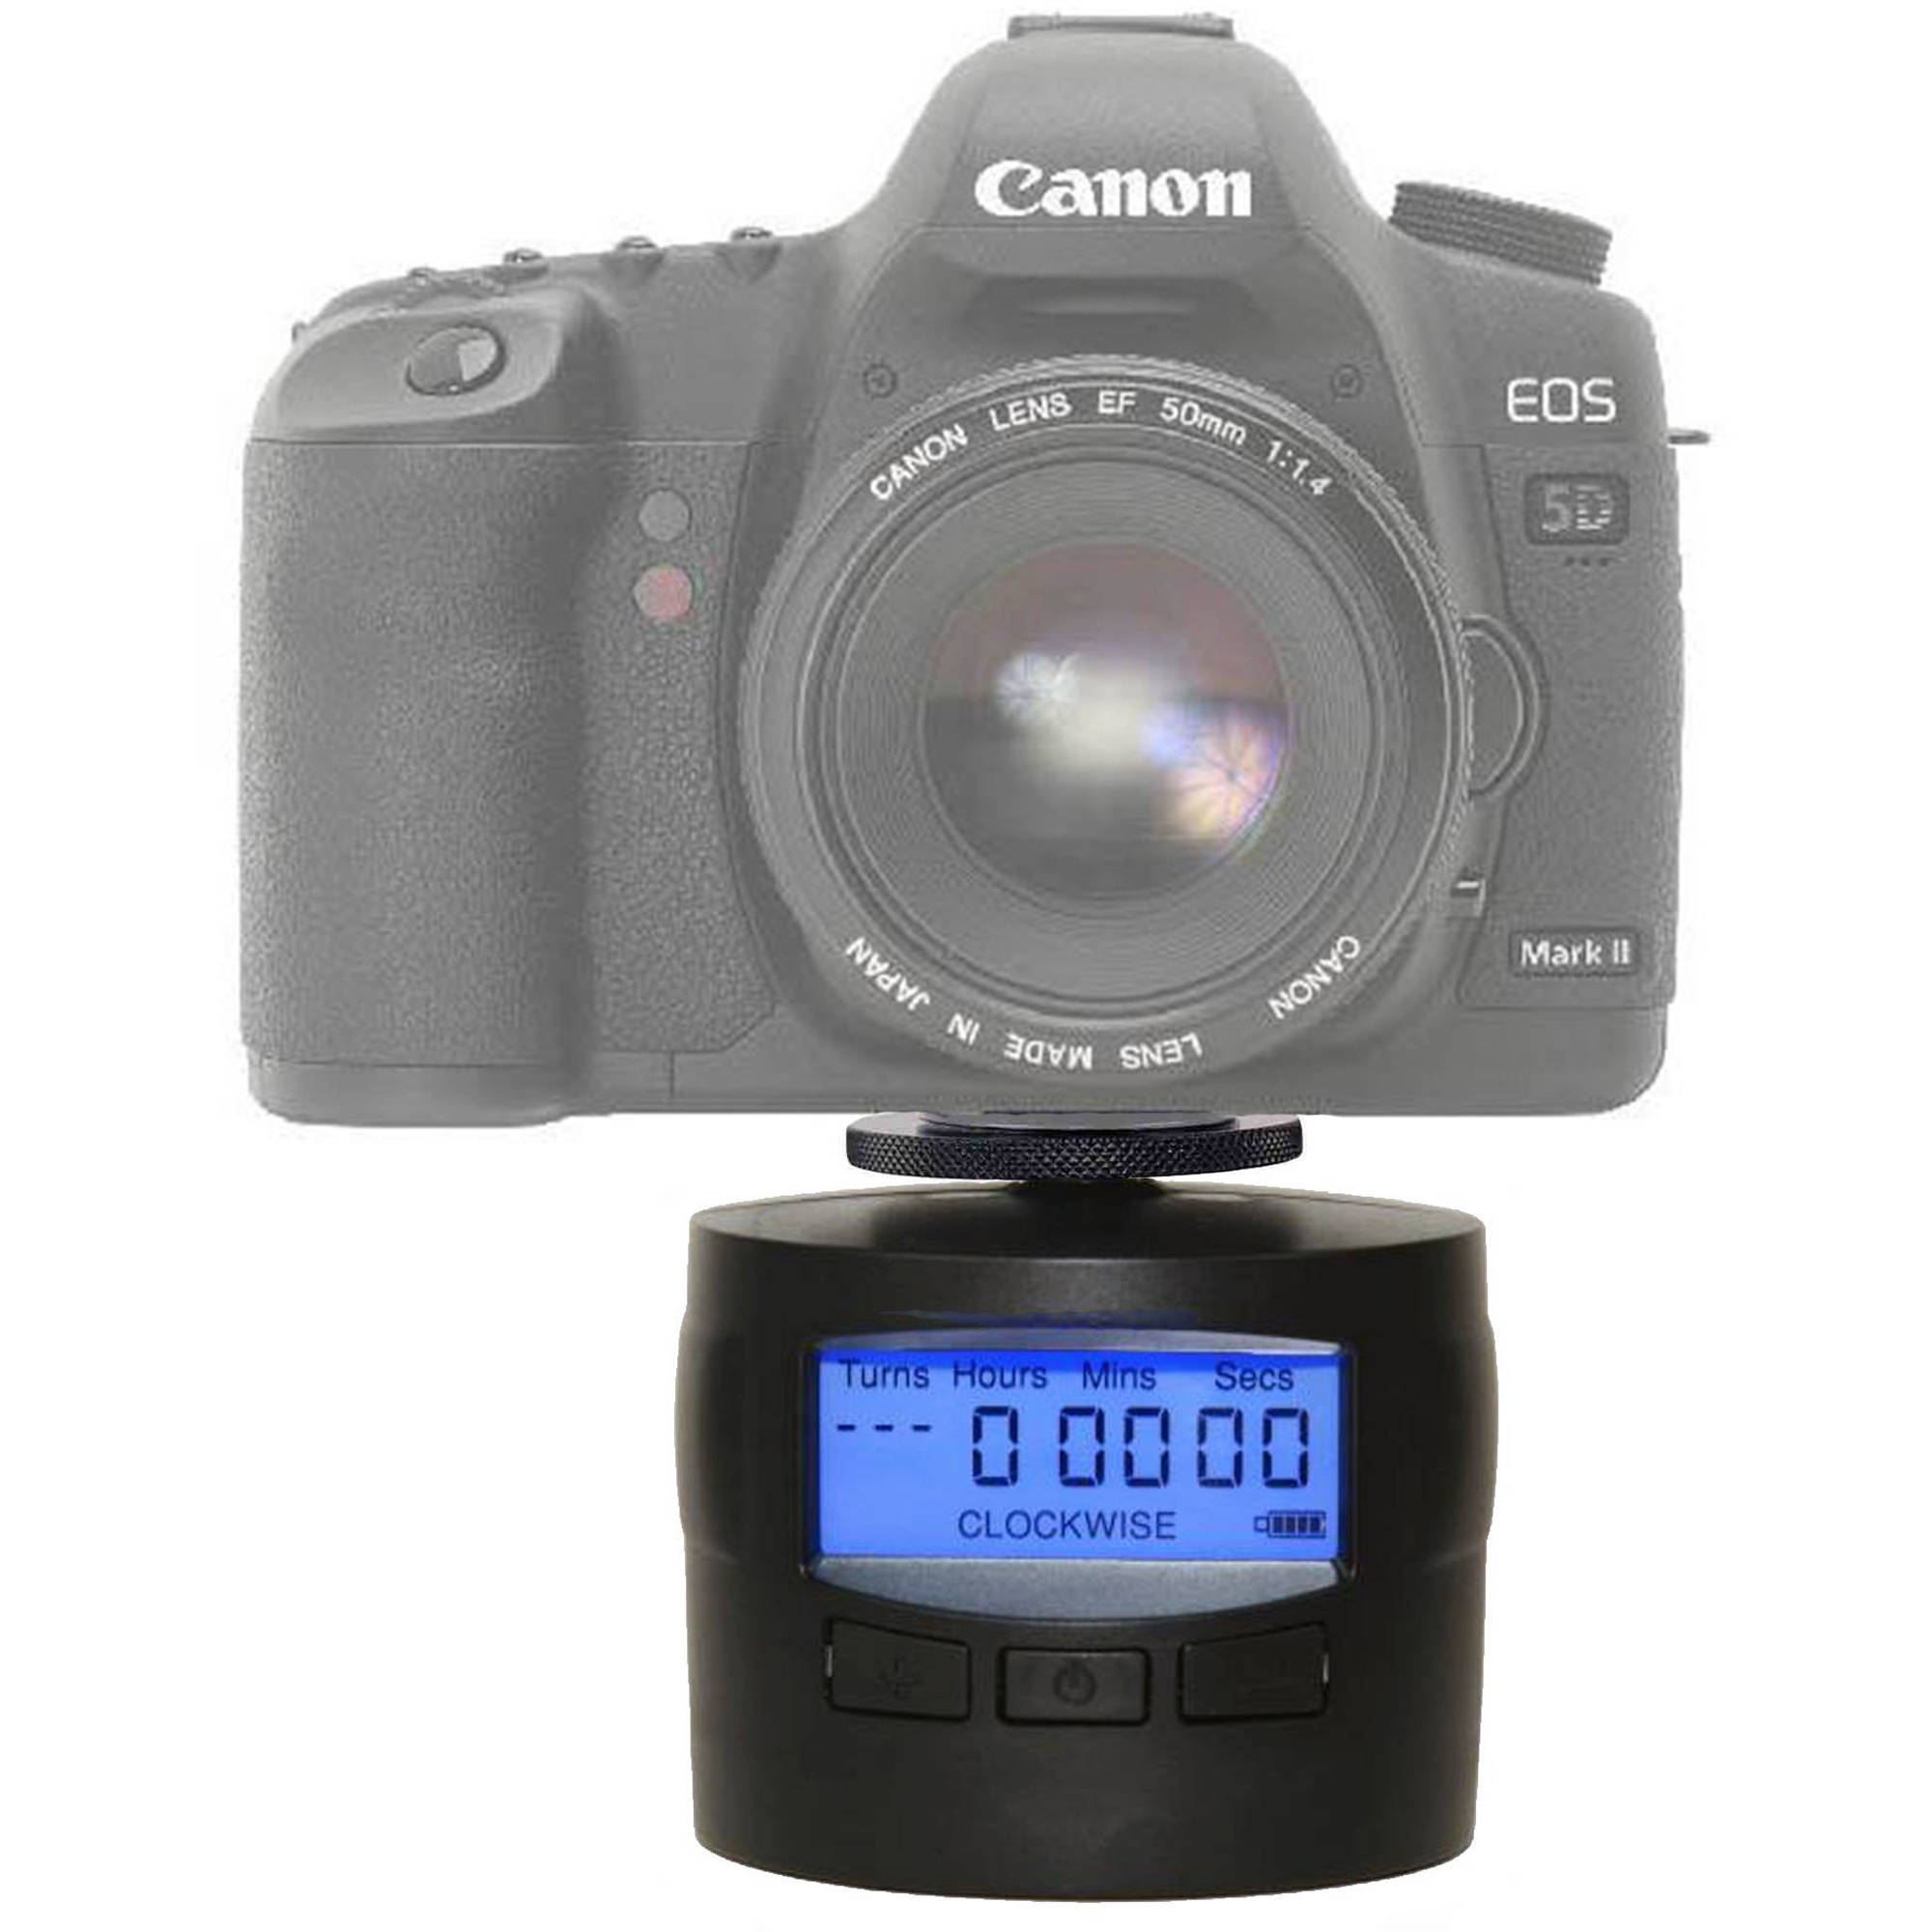 Turnspro Time Lapse Camera Mount 5060456580001 B&H Photo Video